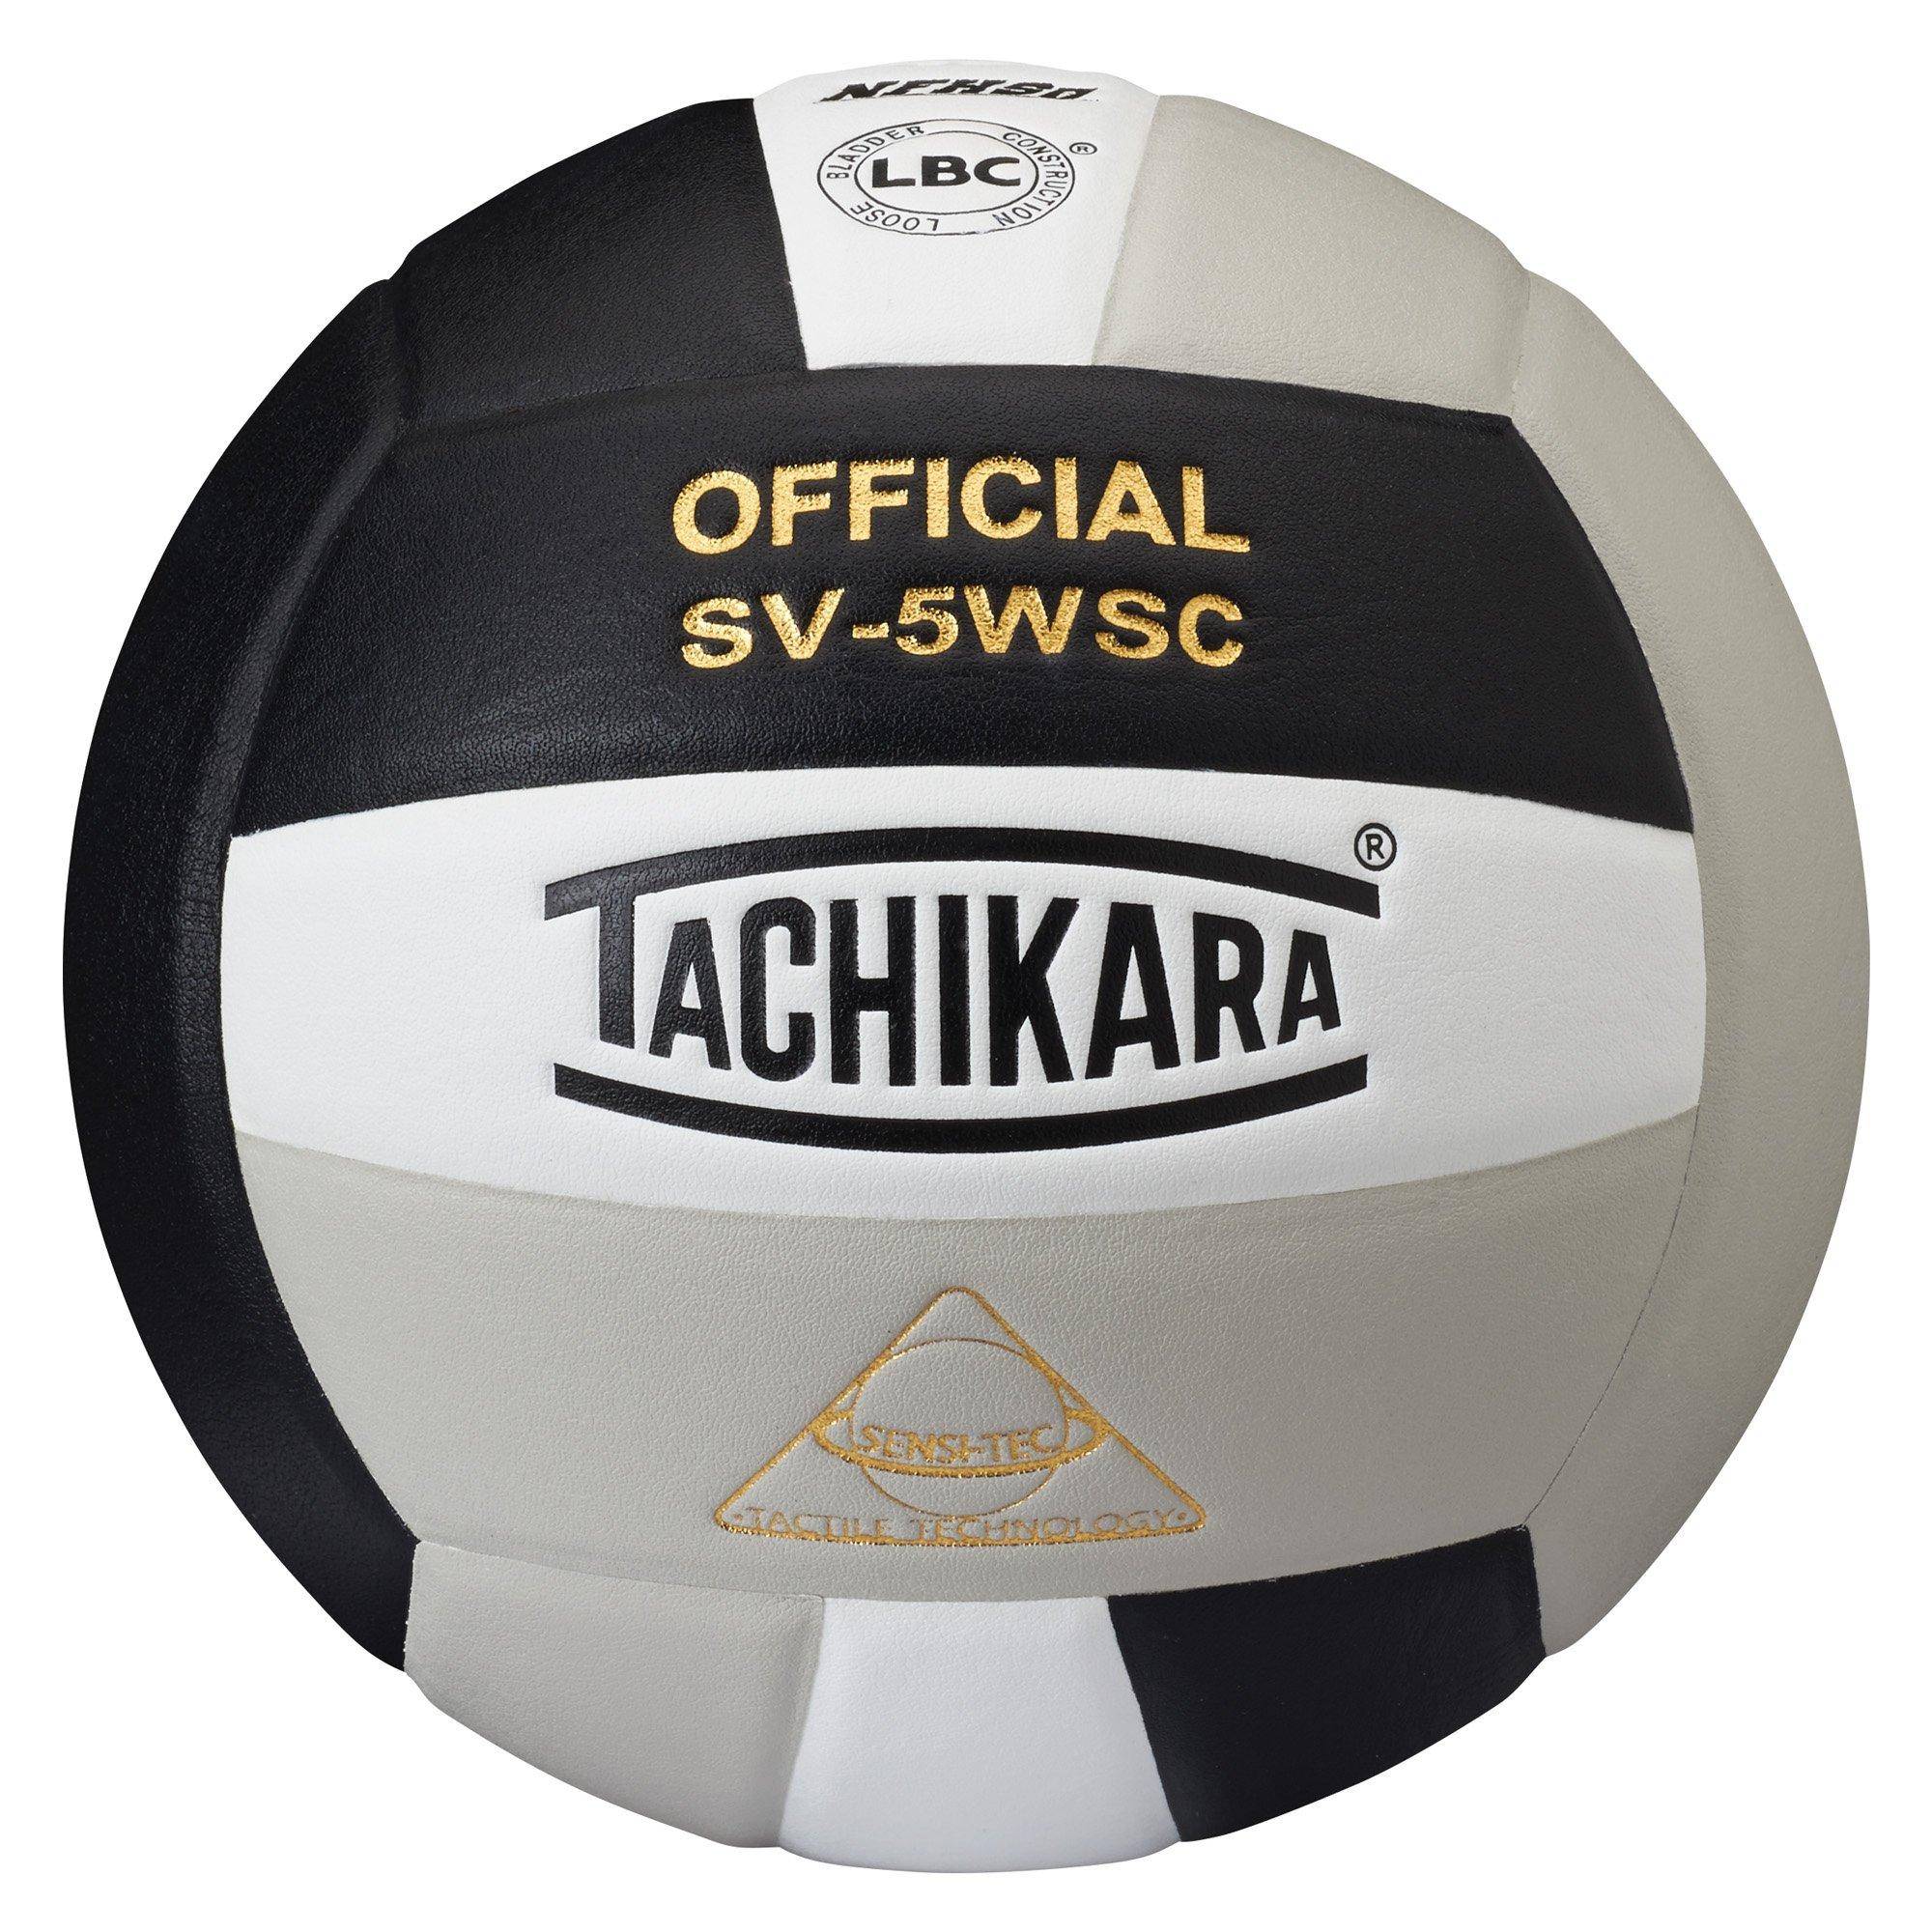 Tachikara Sensi-Tec Composite SV-5WSC Volleyball (EA) by TACHIKARA